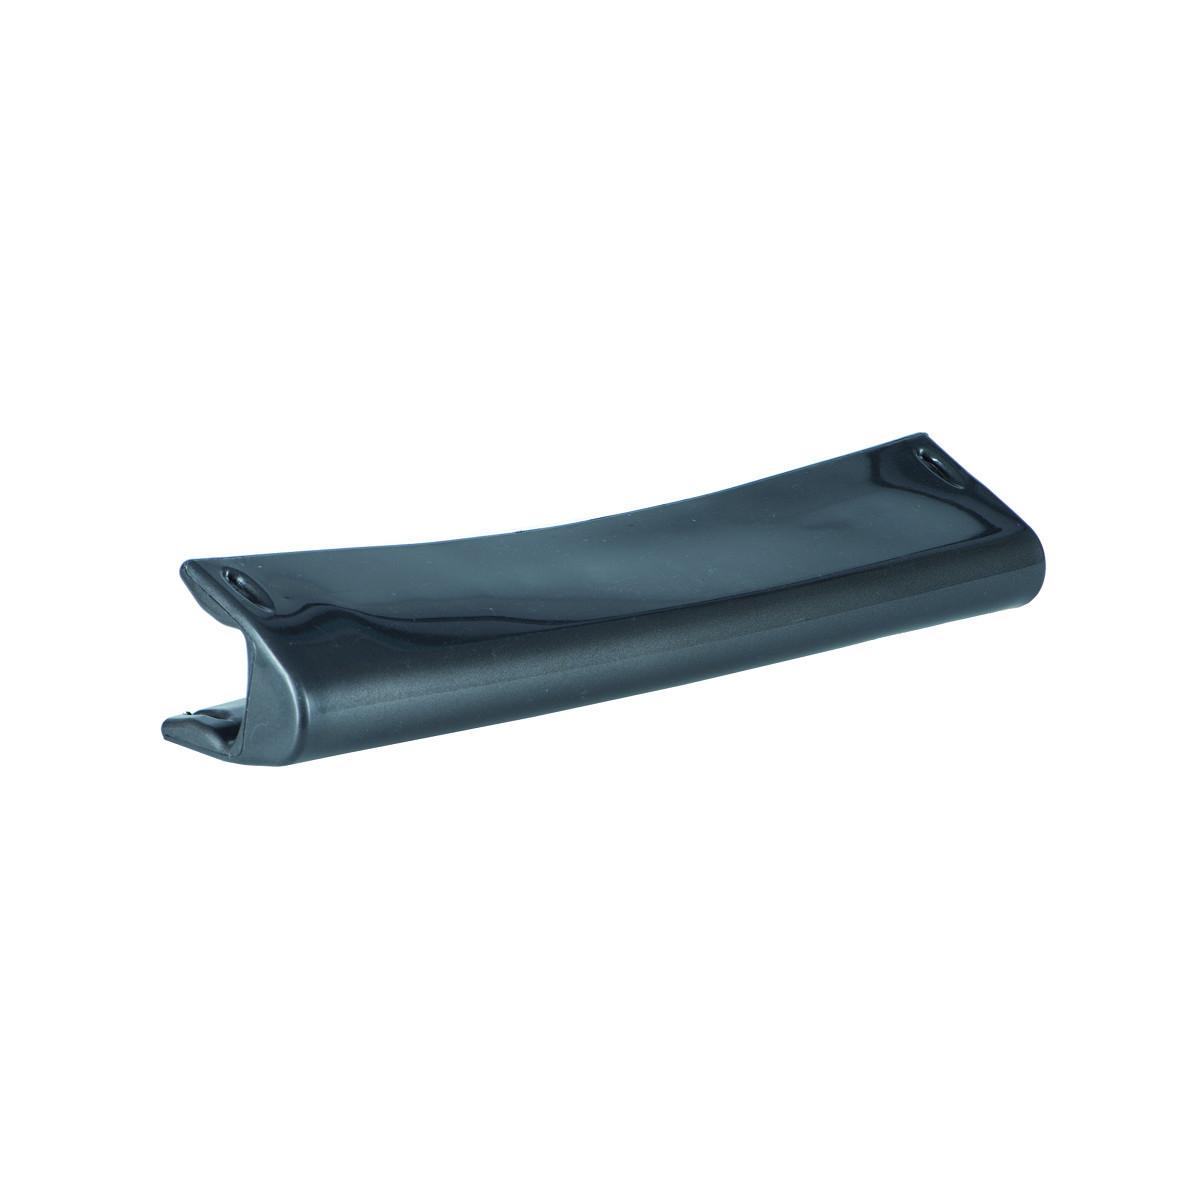 Talamex Boegfender V-Vorm, lengte 60cm, diameter 14cm - antraciet